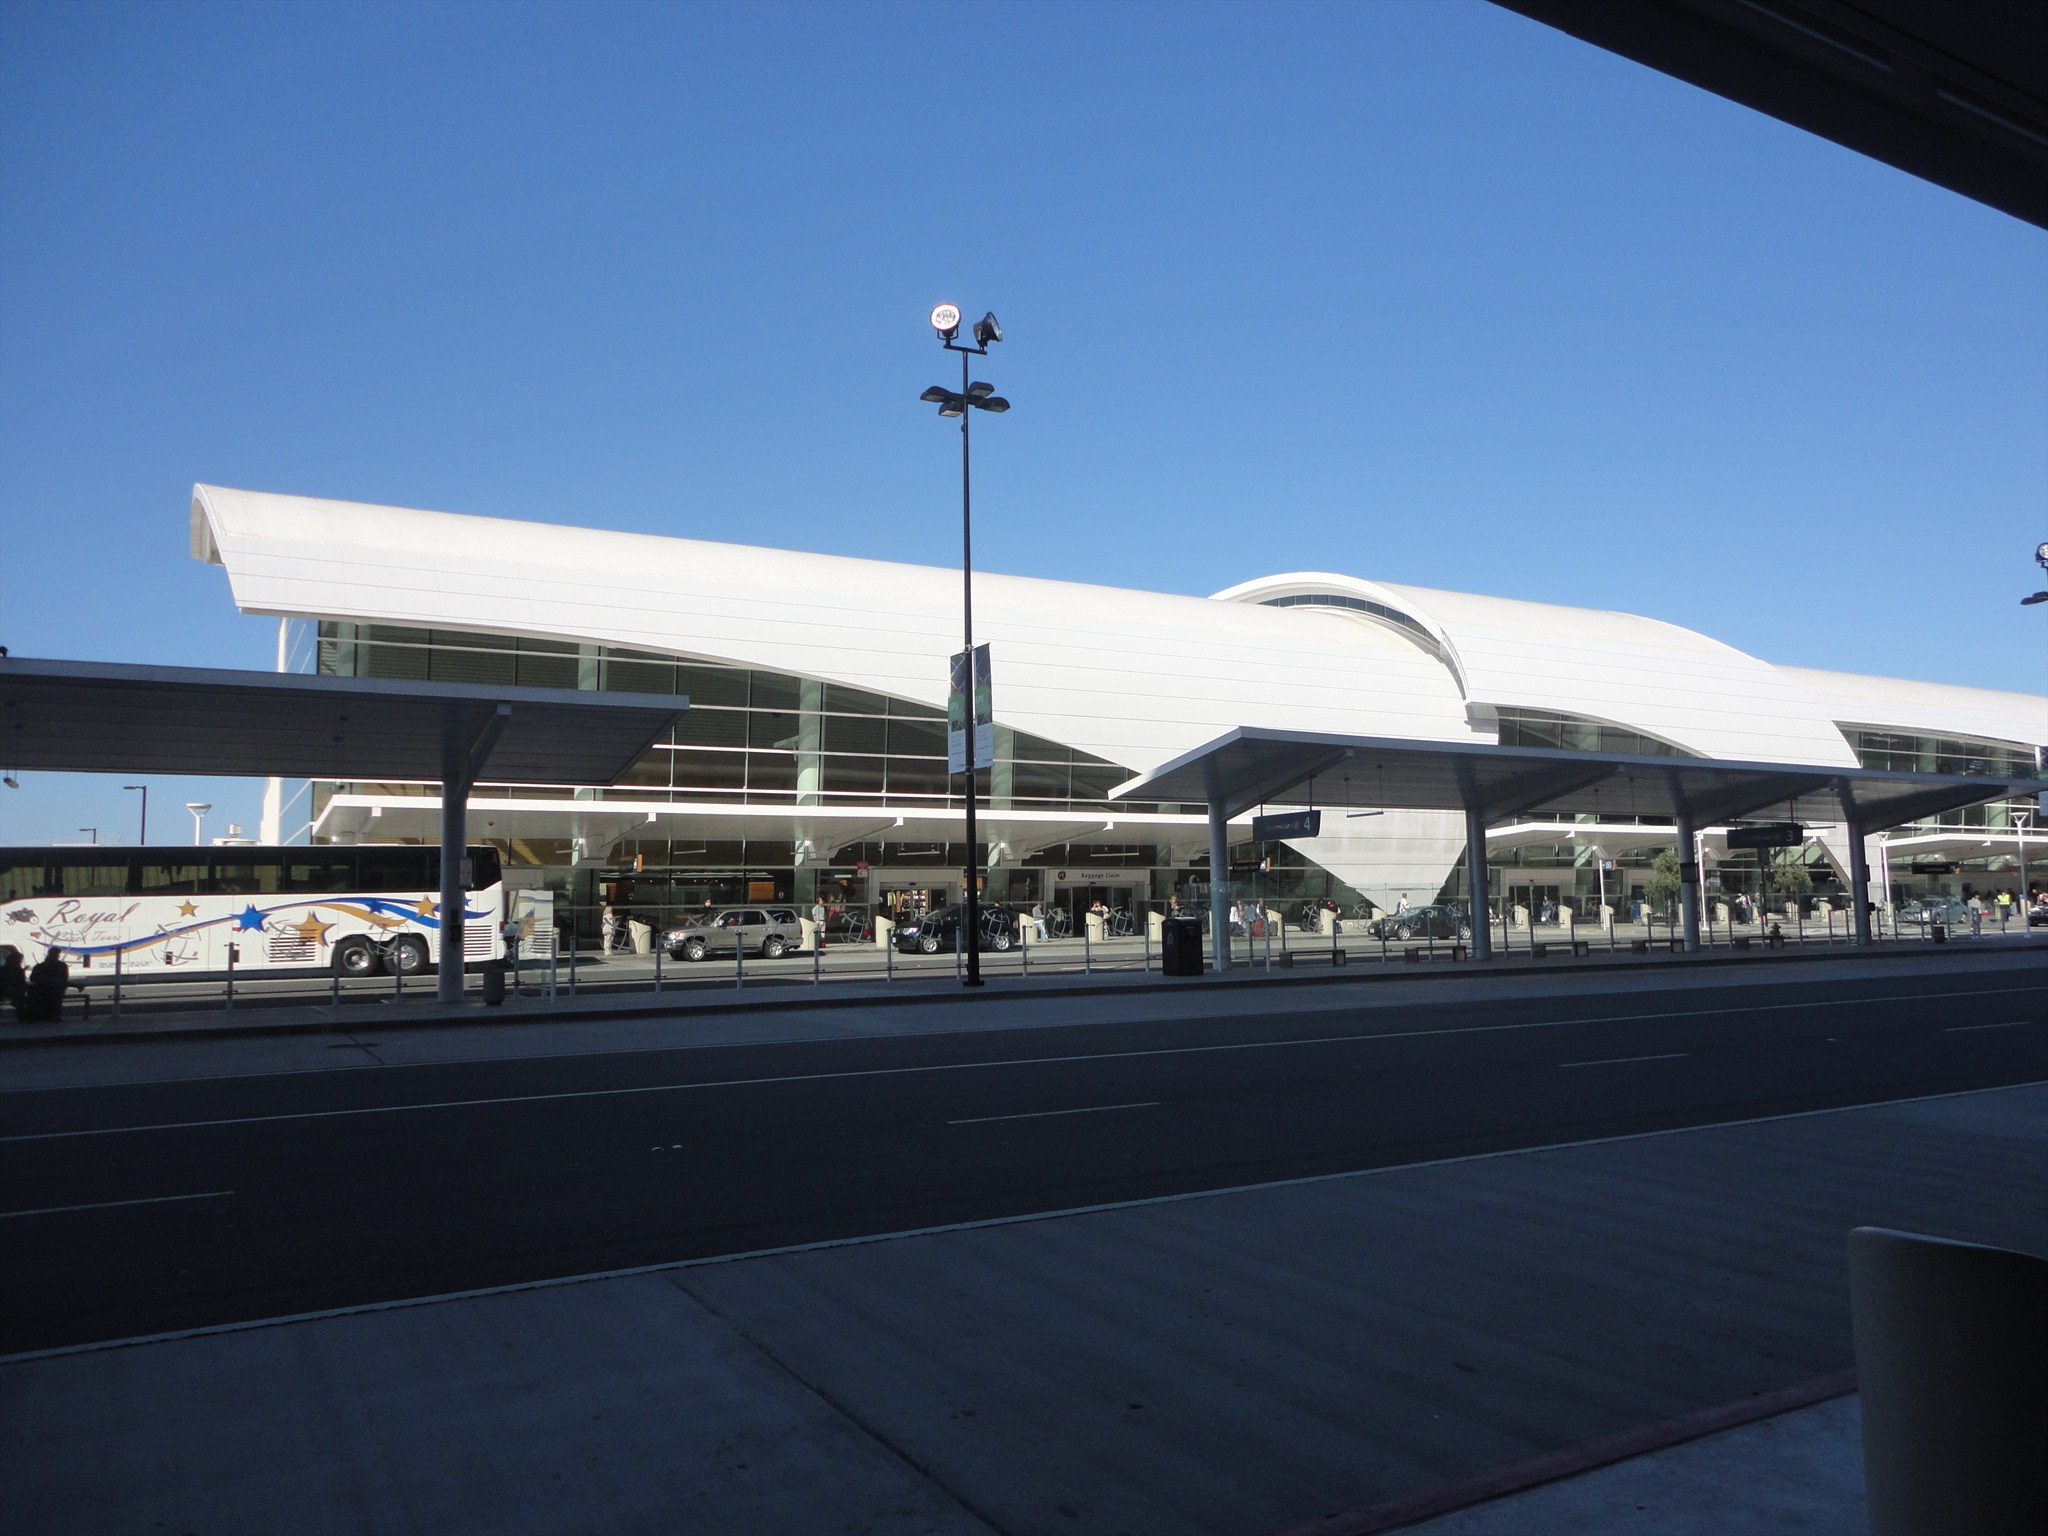 Norman Y. Mineta San Jose International Airport - San Jose, CA Image